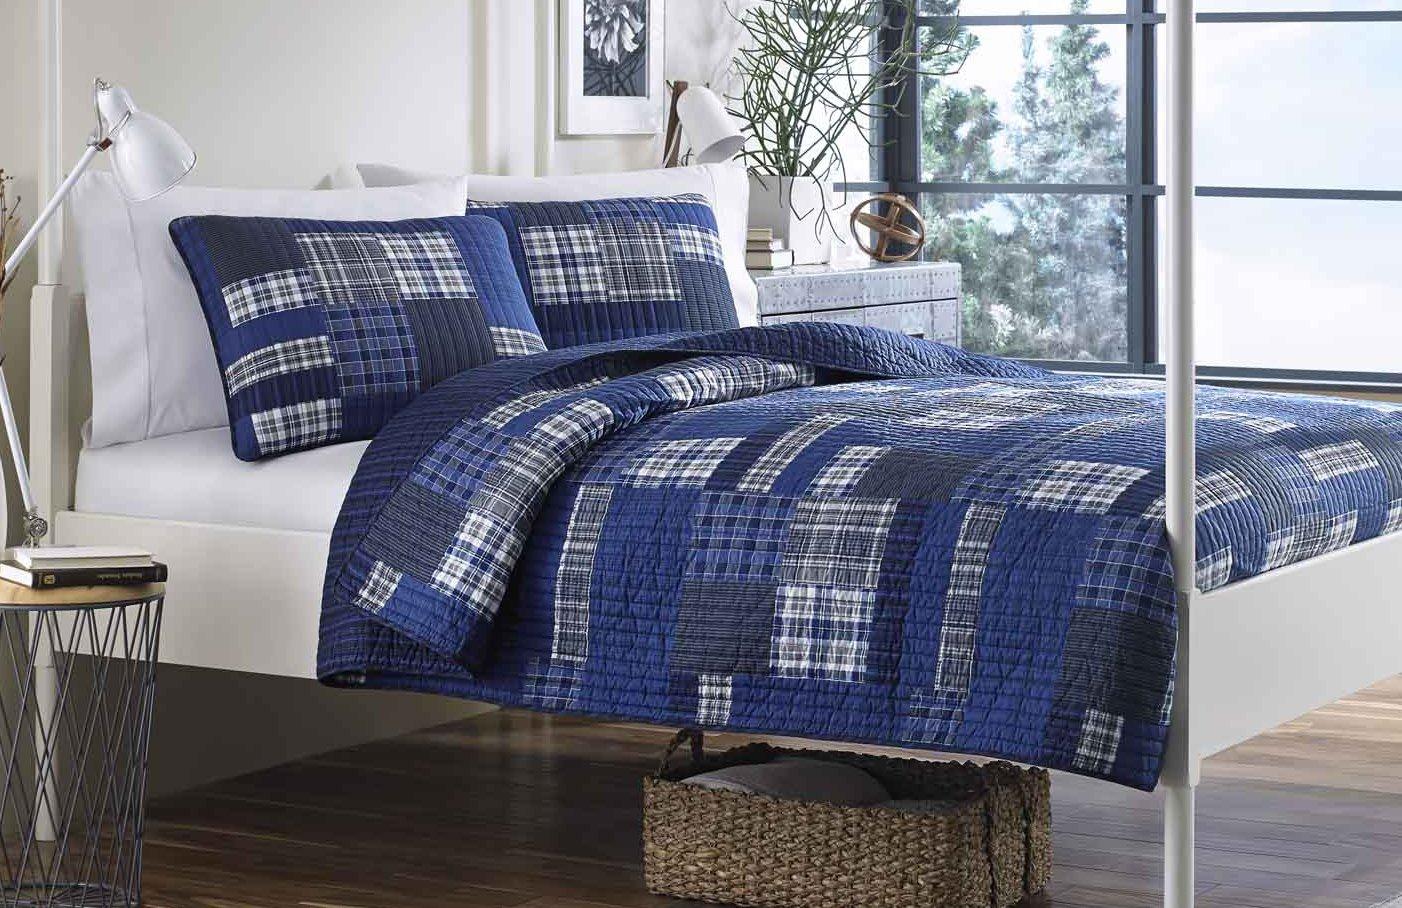 Eddie Bauer Eastmont 3-Piece Cotton Reversible Quilt Set, Full/Queen